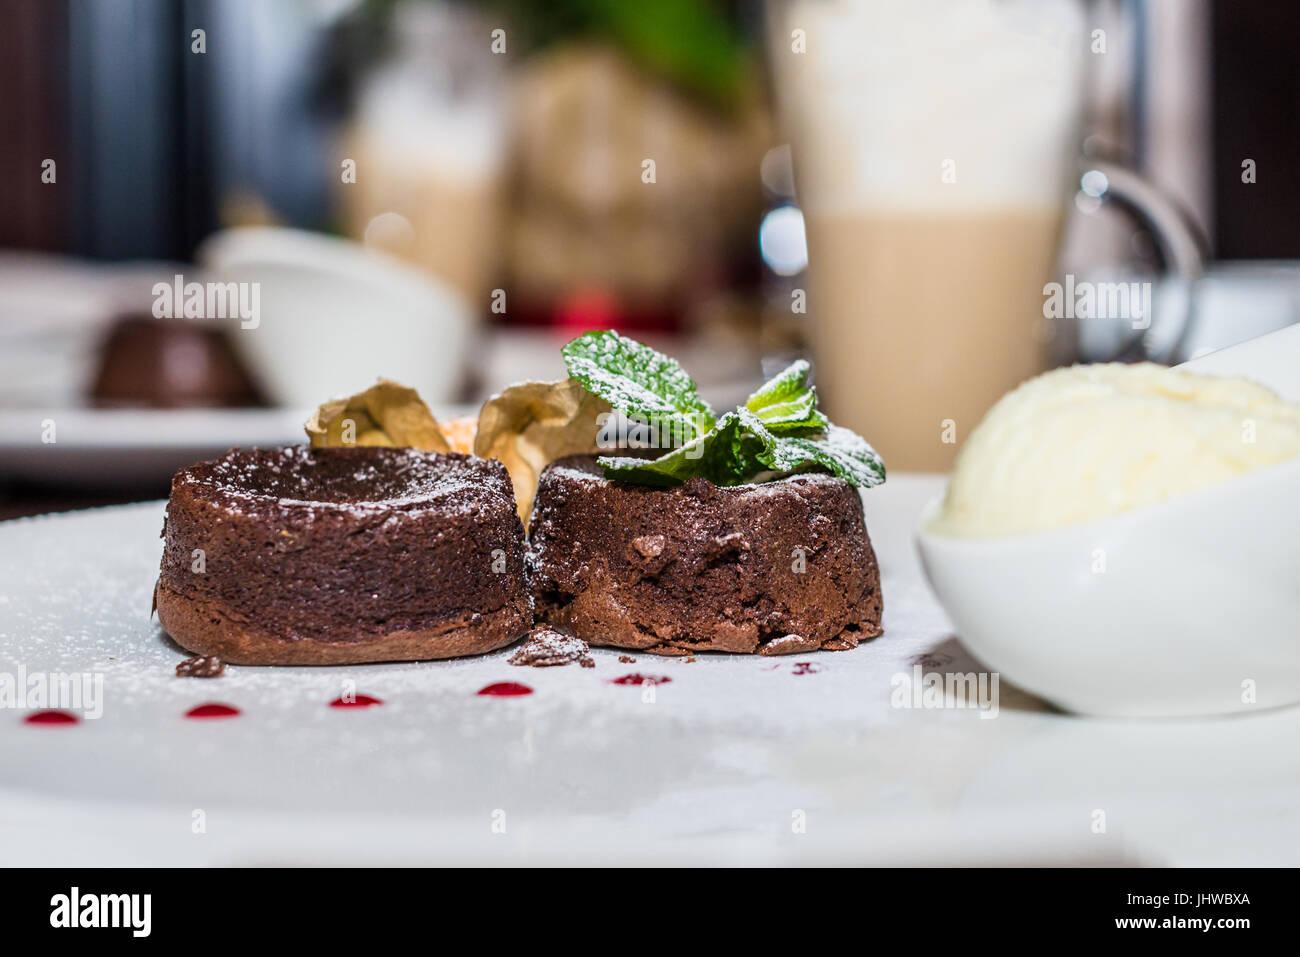 Dessert gâteau au chocolat chaud Photo Stock